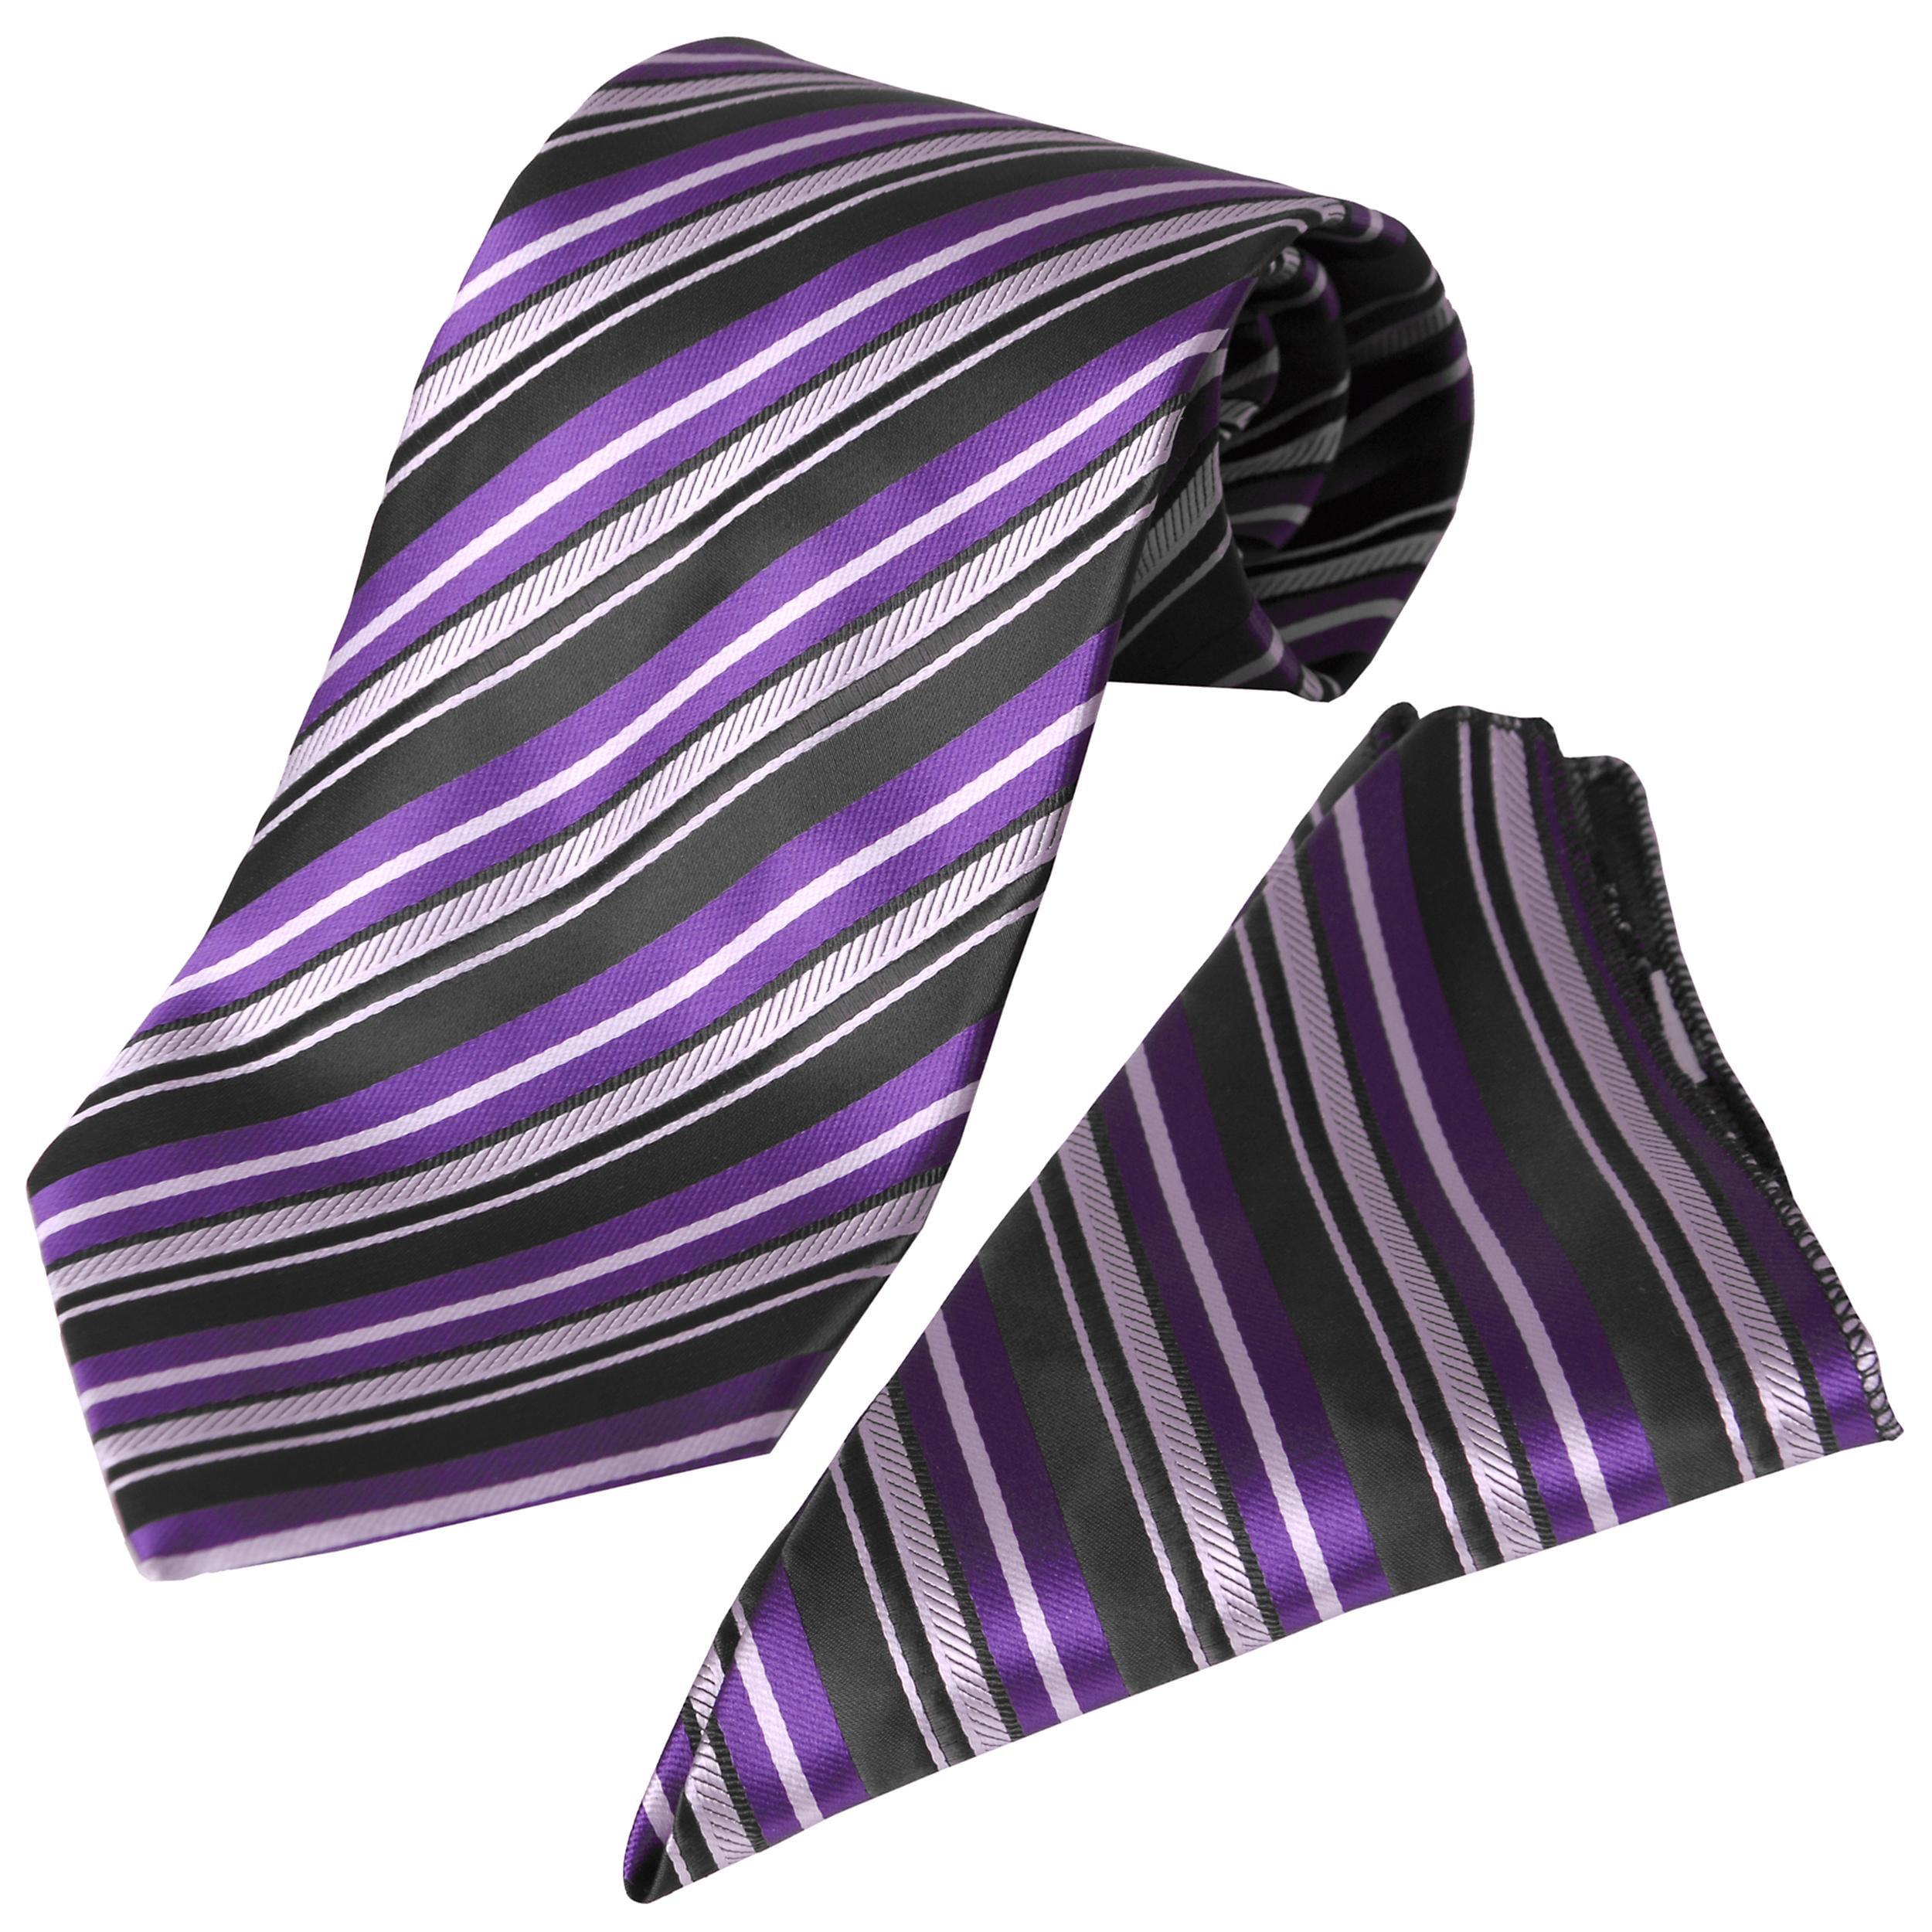 Boston Traveler Men's Purple Striped Tie Hanky Set